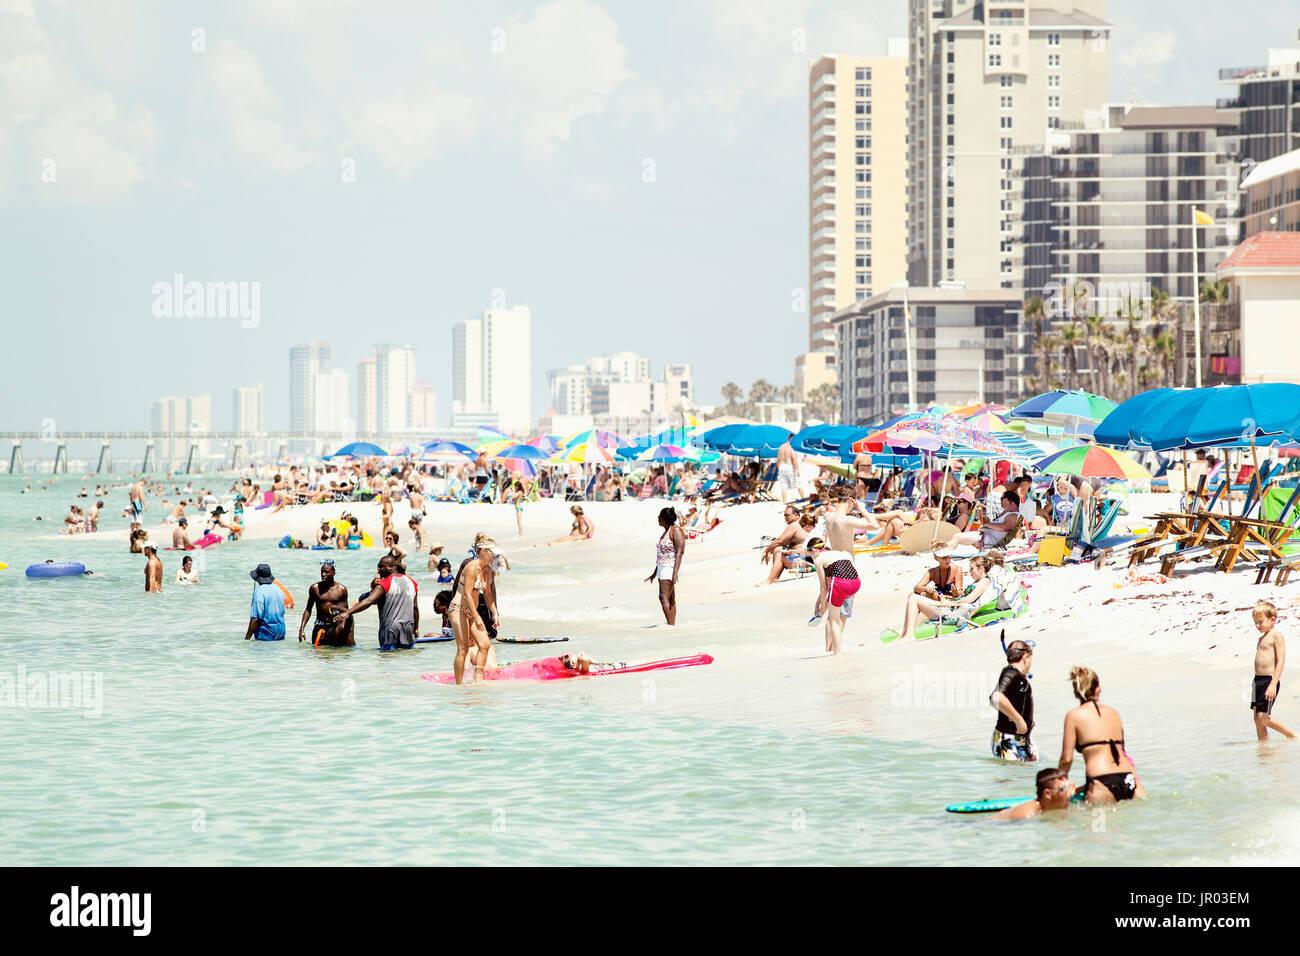 Vacationing In Panama City Beach